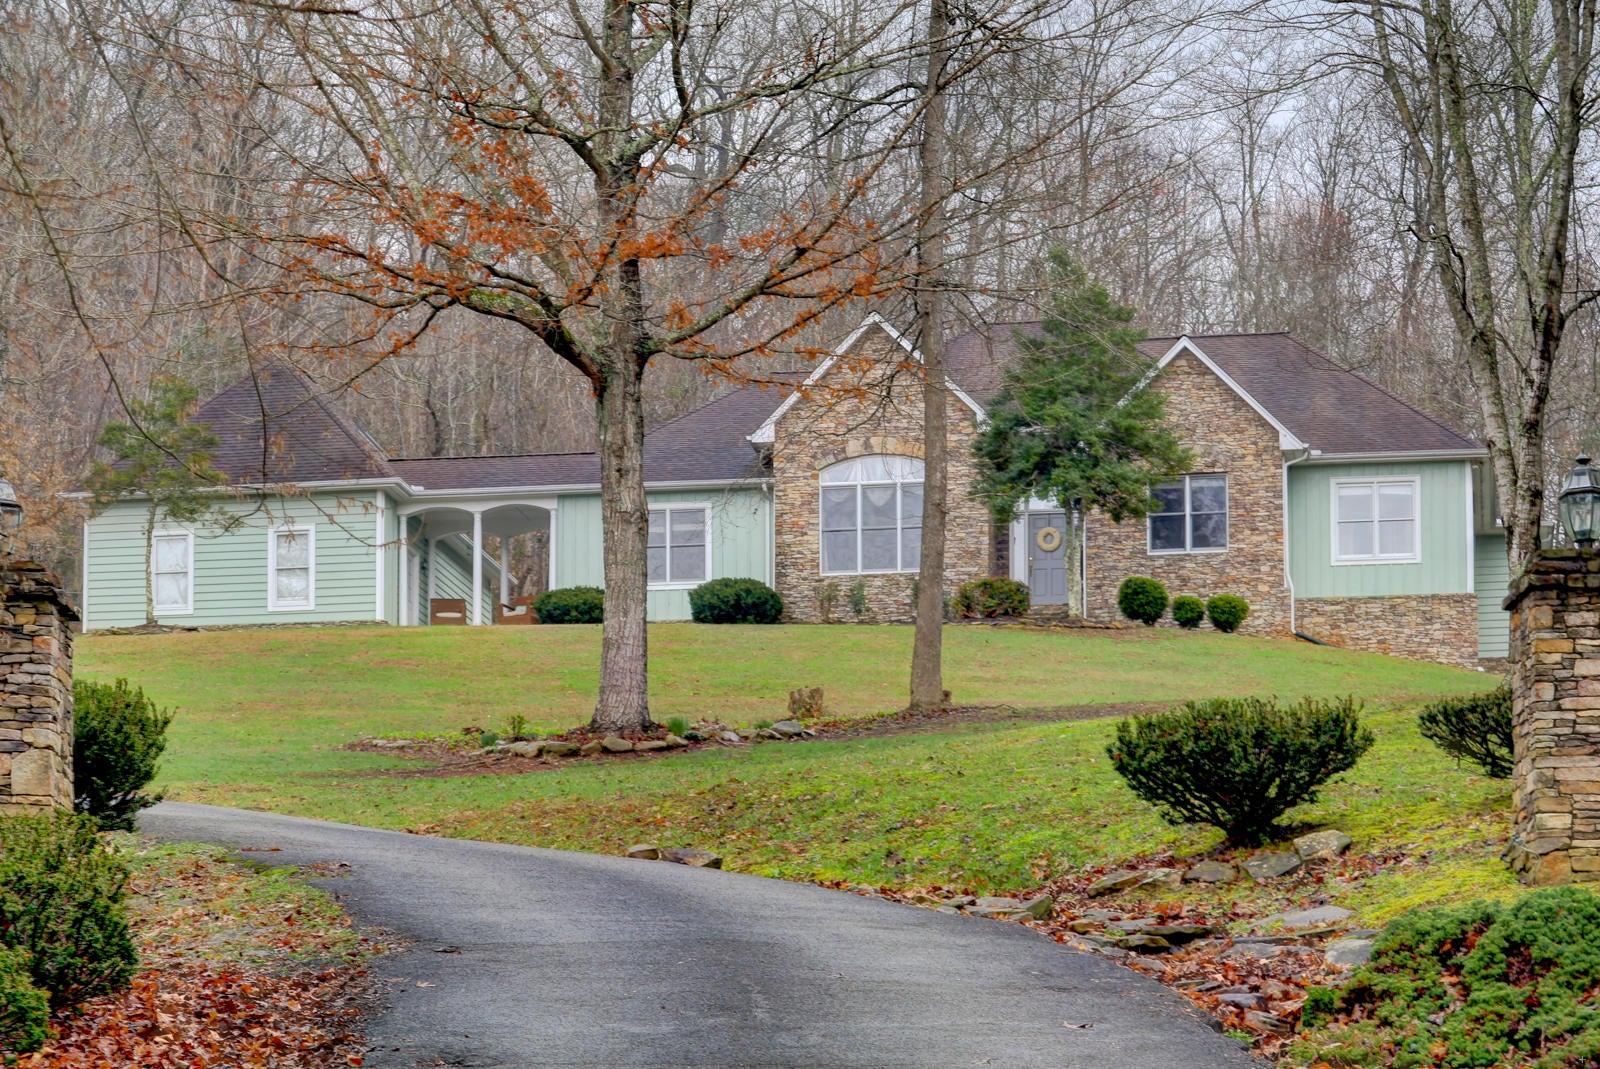 独户住宅 为 销售 在 Address Not Available Andersonville, 田纳西州 37705 美国